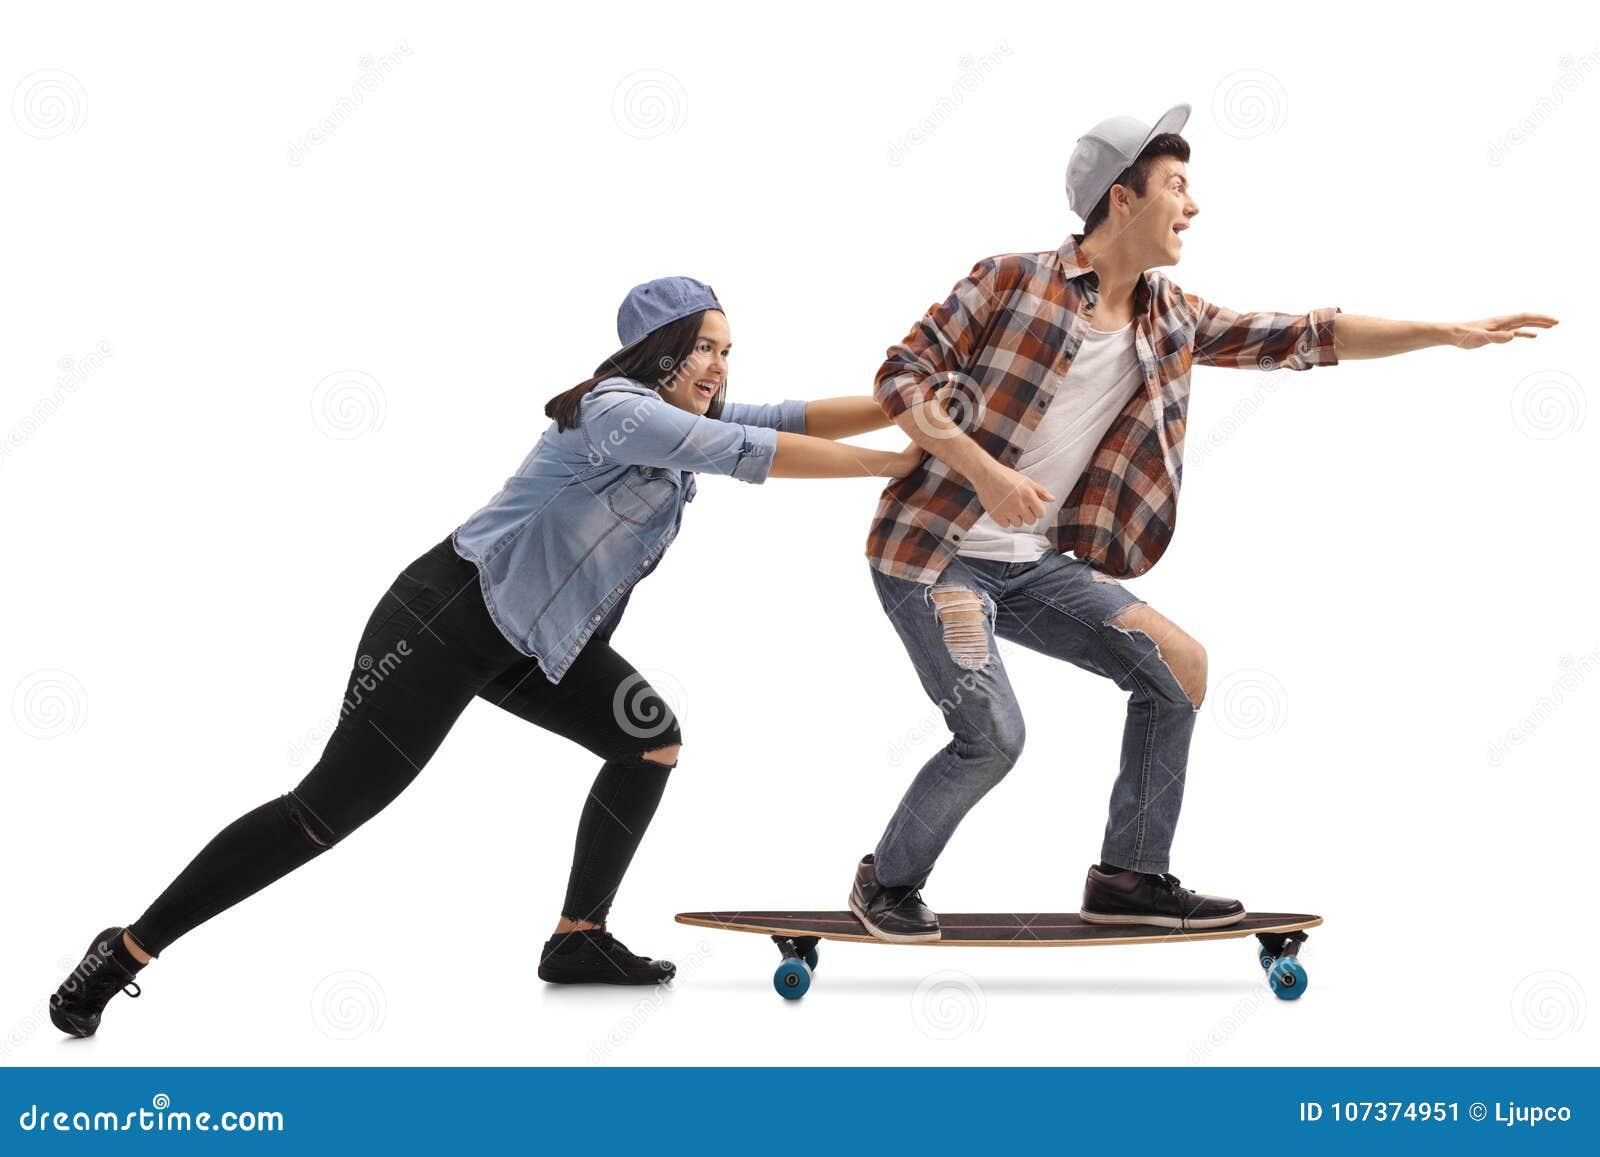 Teenage girl pushing a teenage boy on a longboard